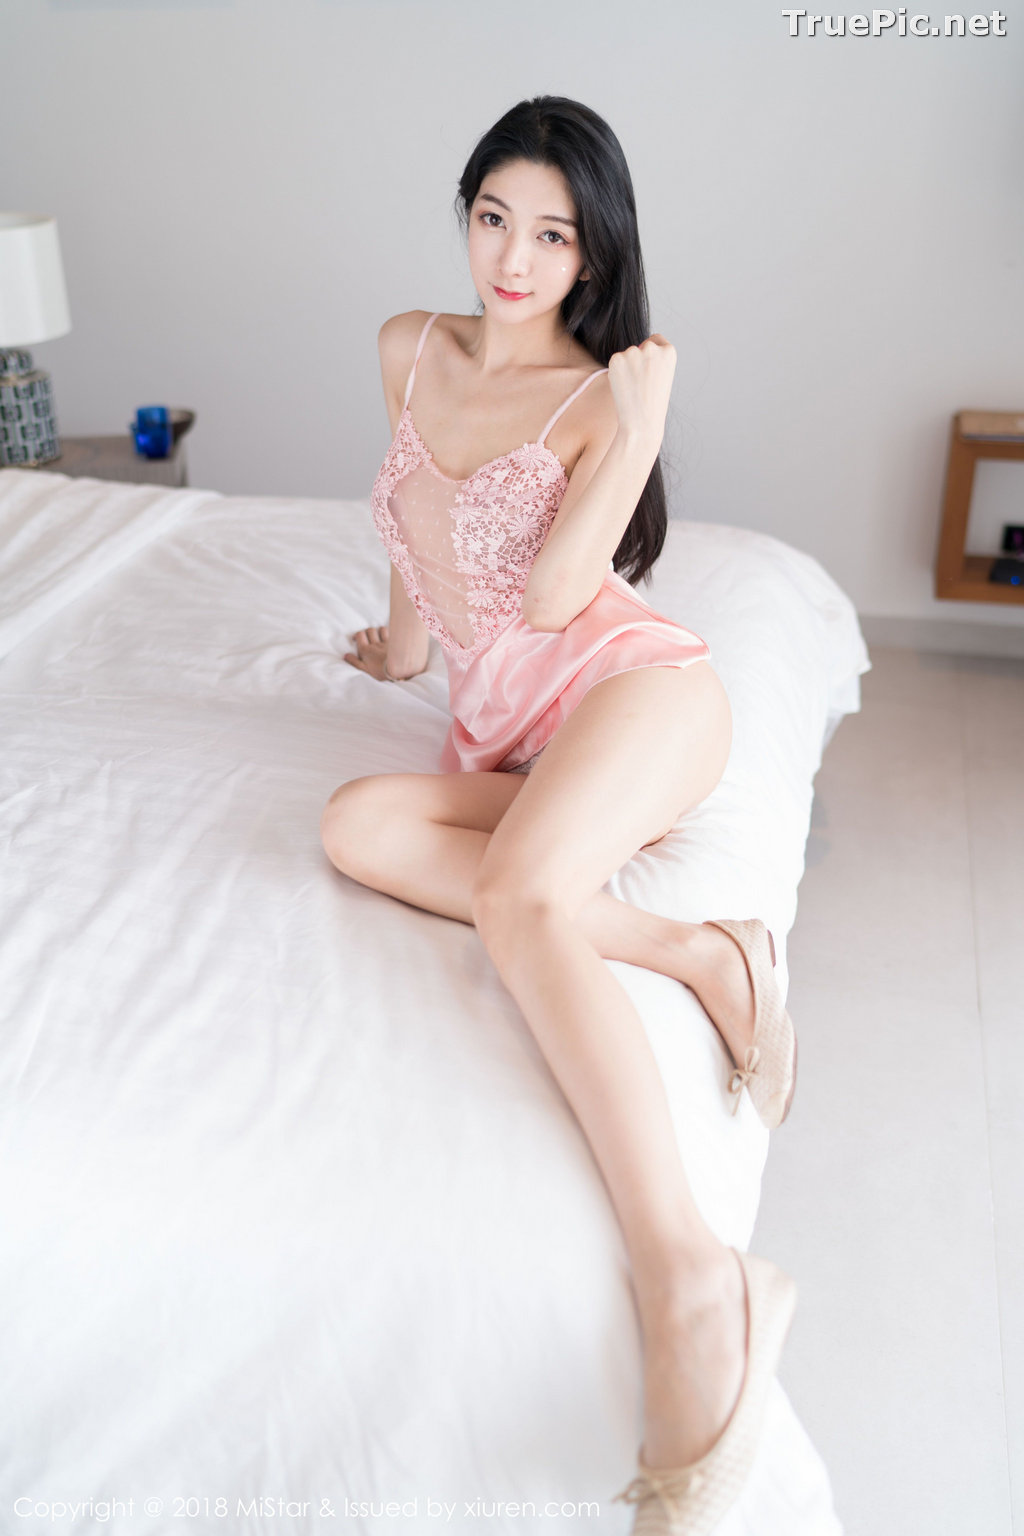 Image MiStar Vol.238 - Chinese Model - Xiao Reba (Angela小热巴) - Sleep Dress and Monokini - TruePic.net - Picture-5